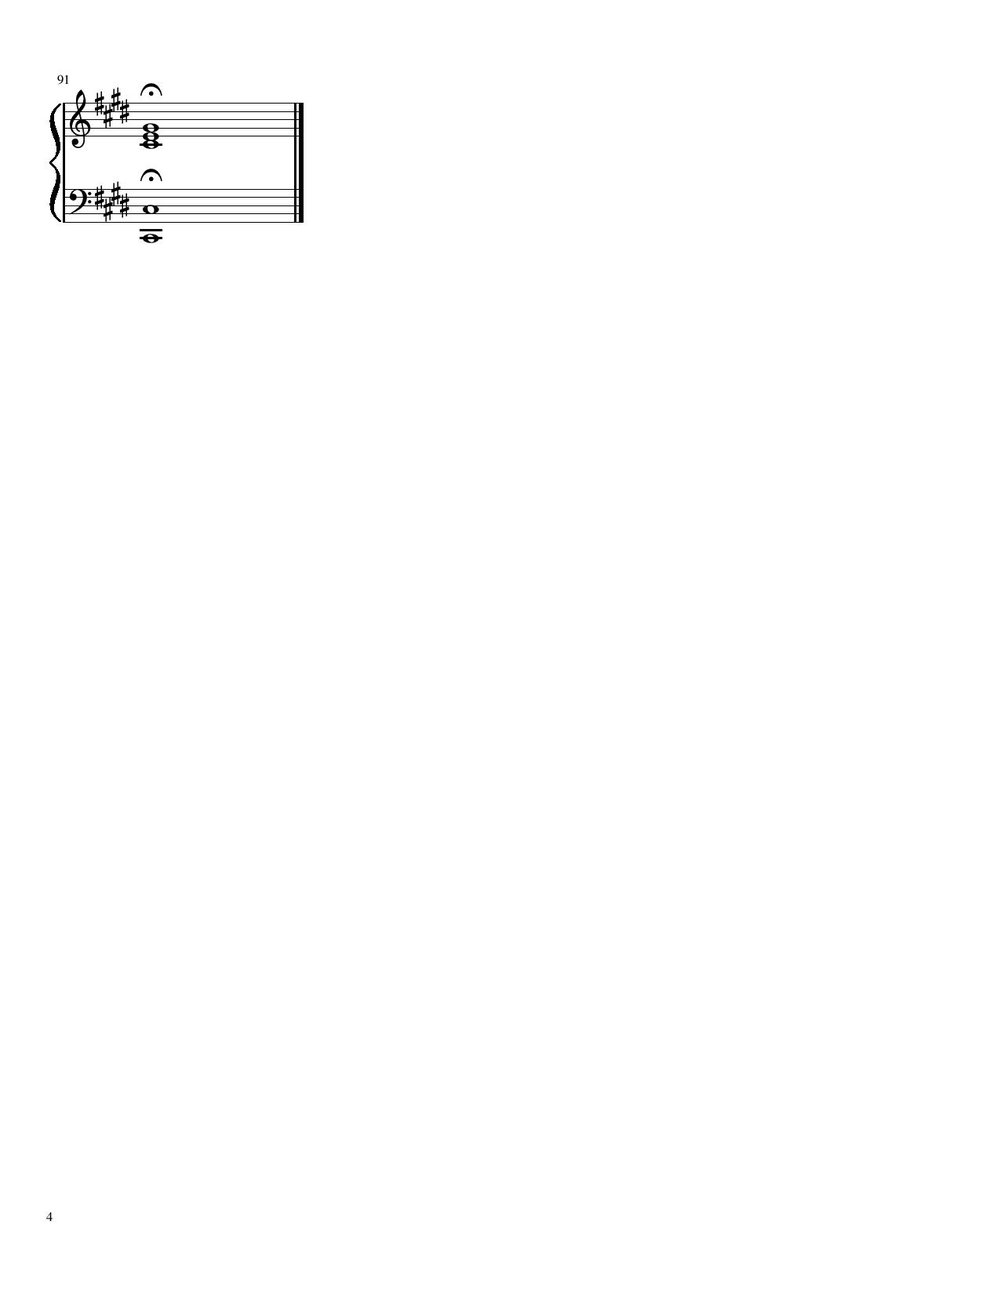 Jealous_-_Labrinth_piano_accompaniment-page-004.jpg